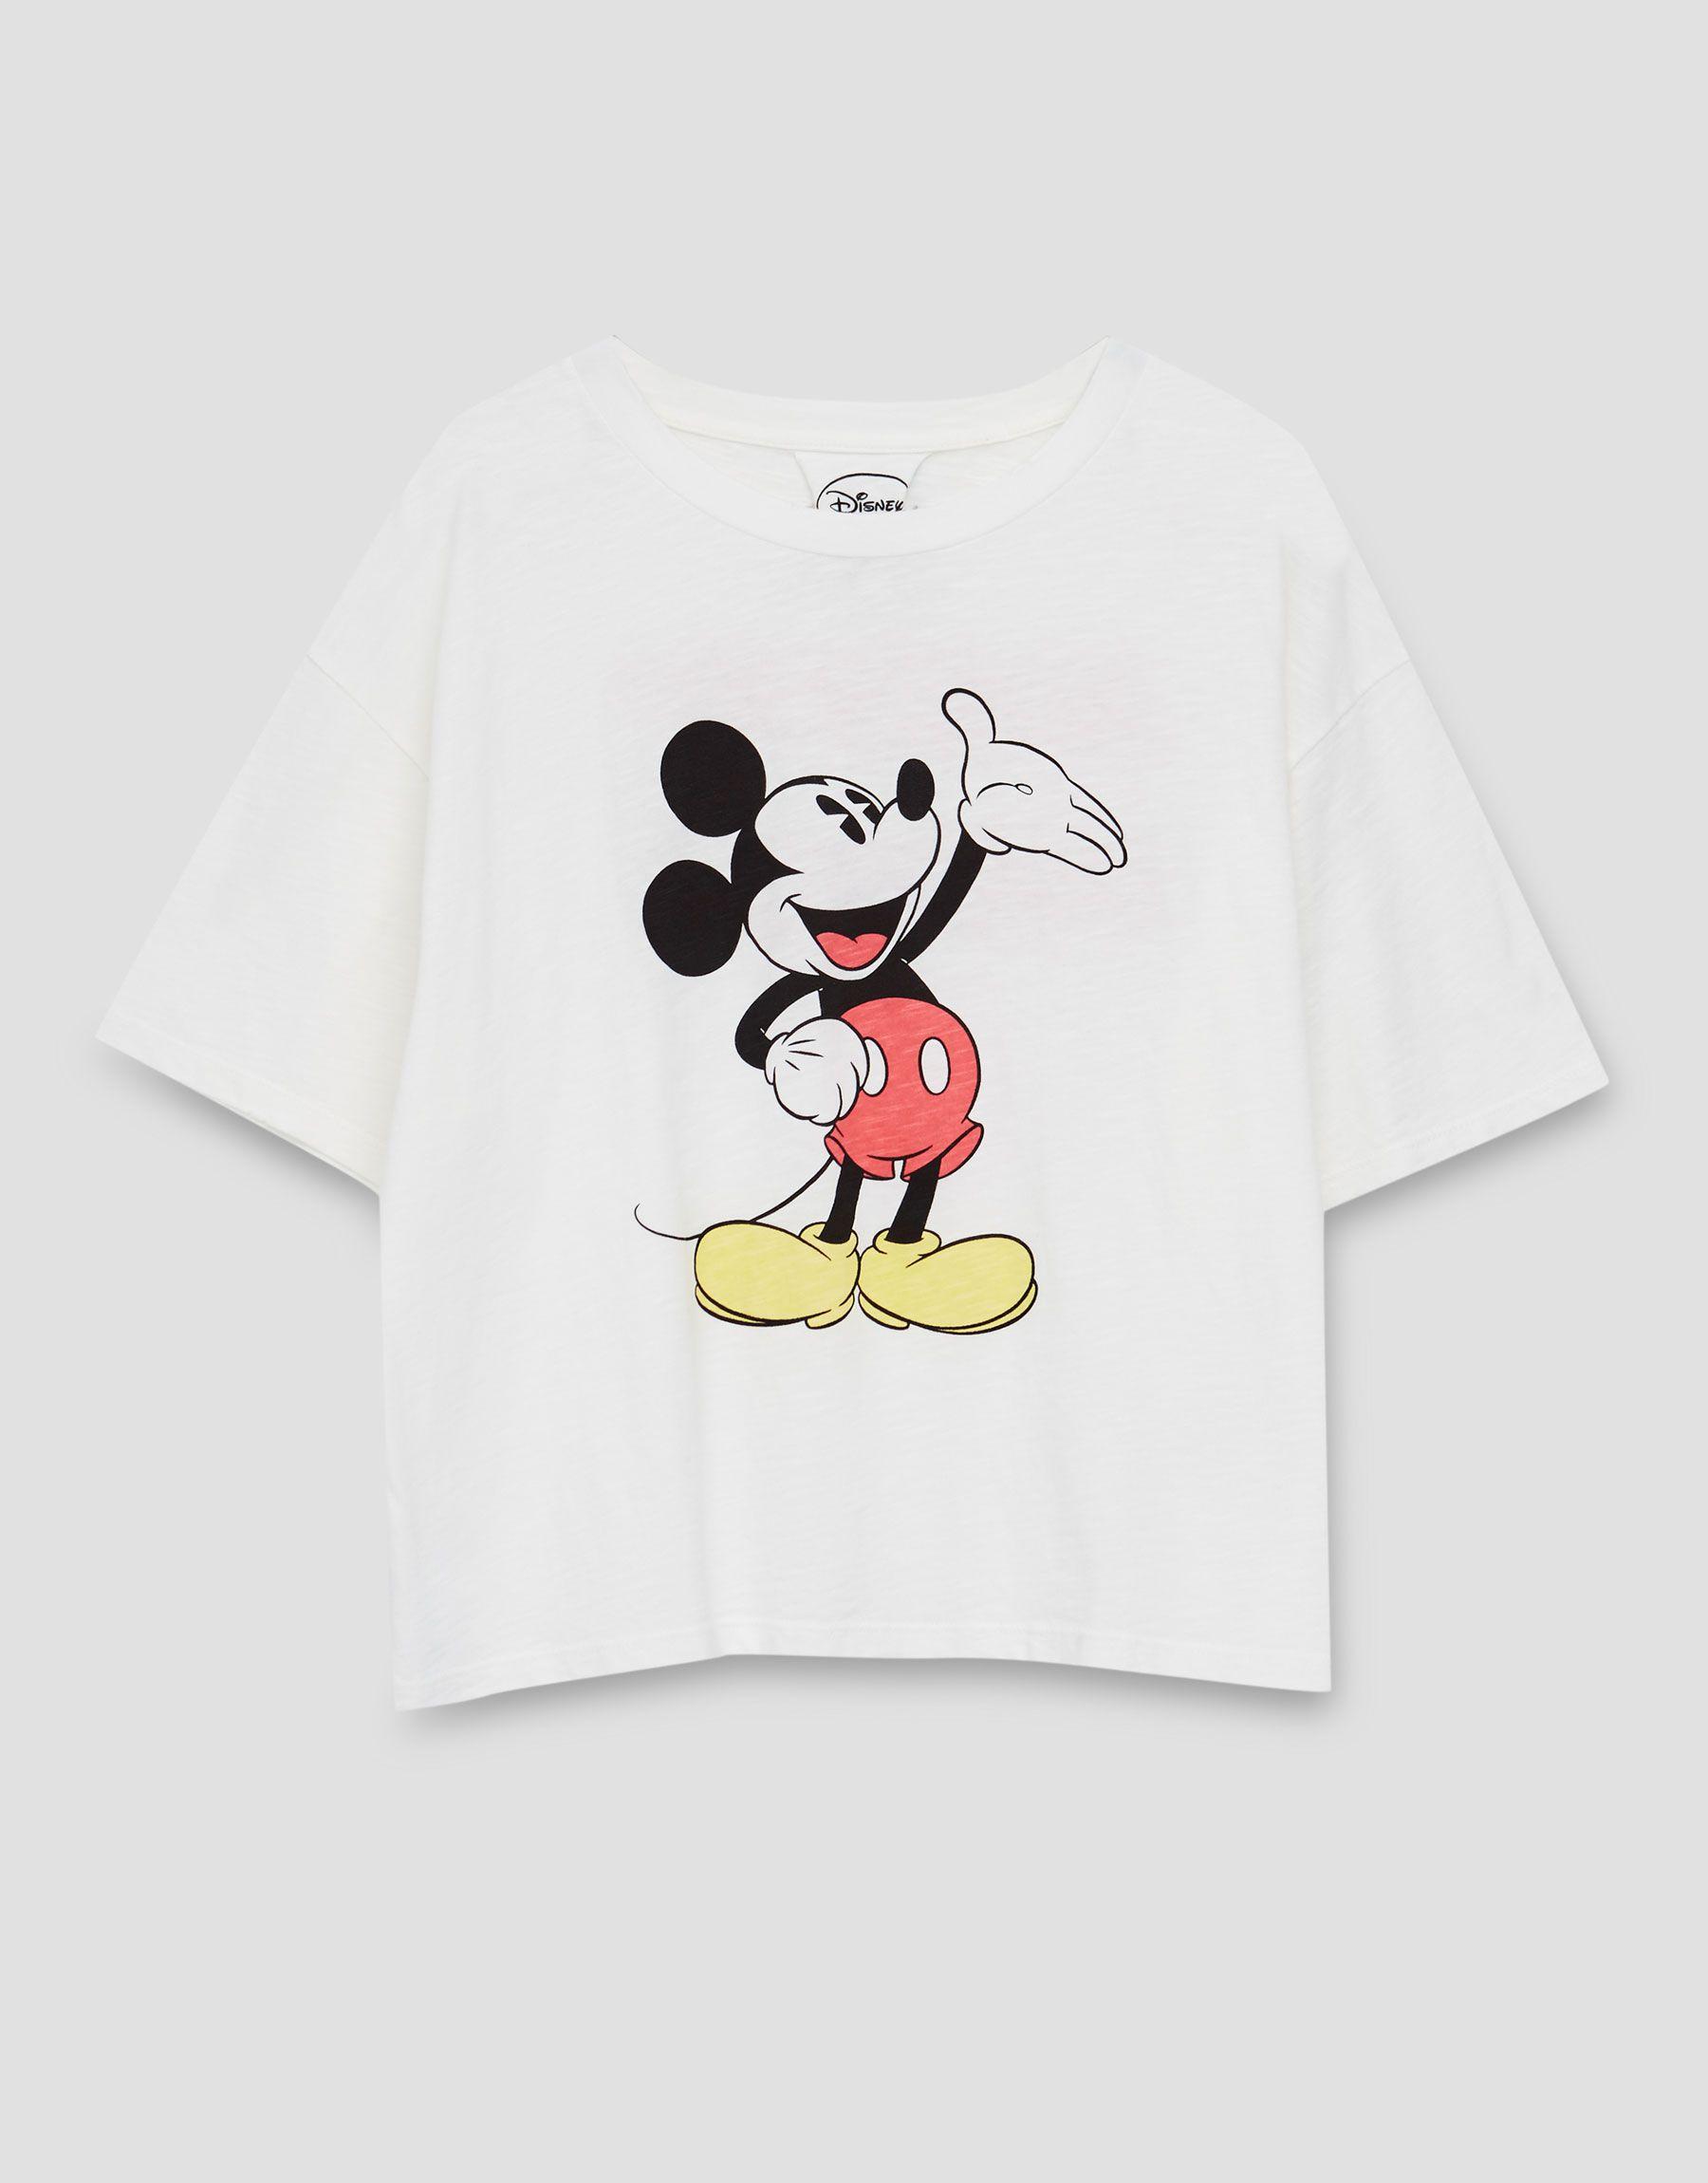 Camiseta Crop Mickey Mouse Camisetas Ropa Mujer Pull Bear Espana Camisa De Mickey Ropa Disney Camisetas De Mickey Mouse